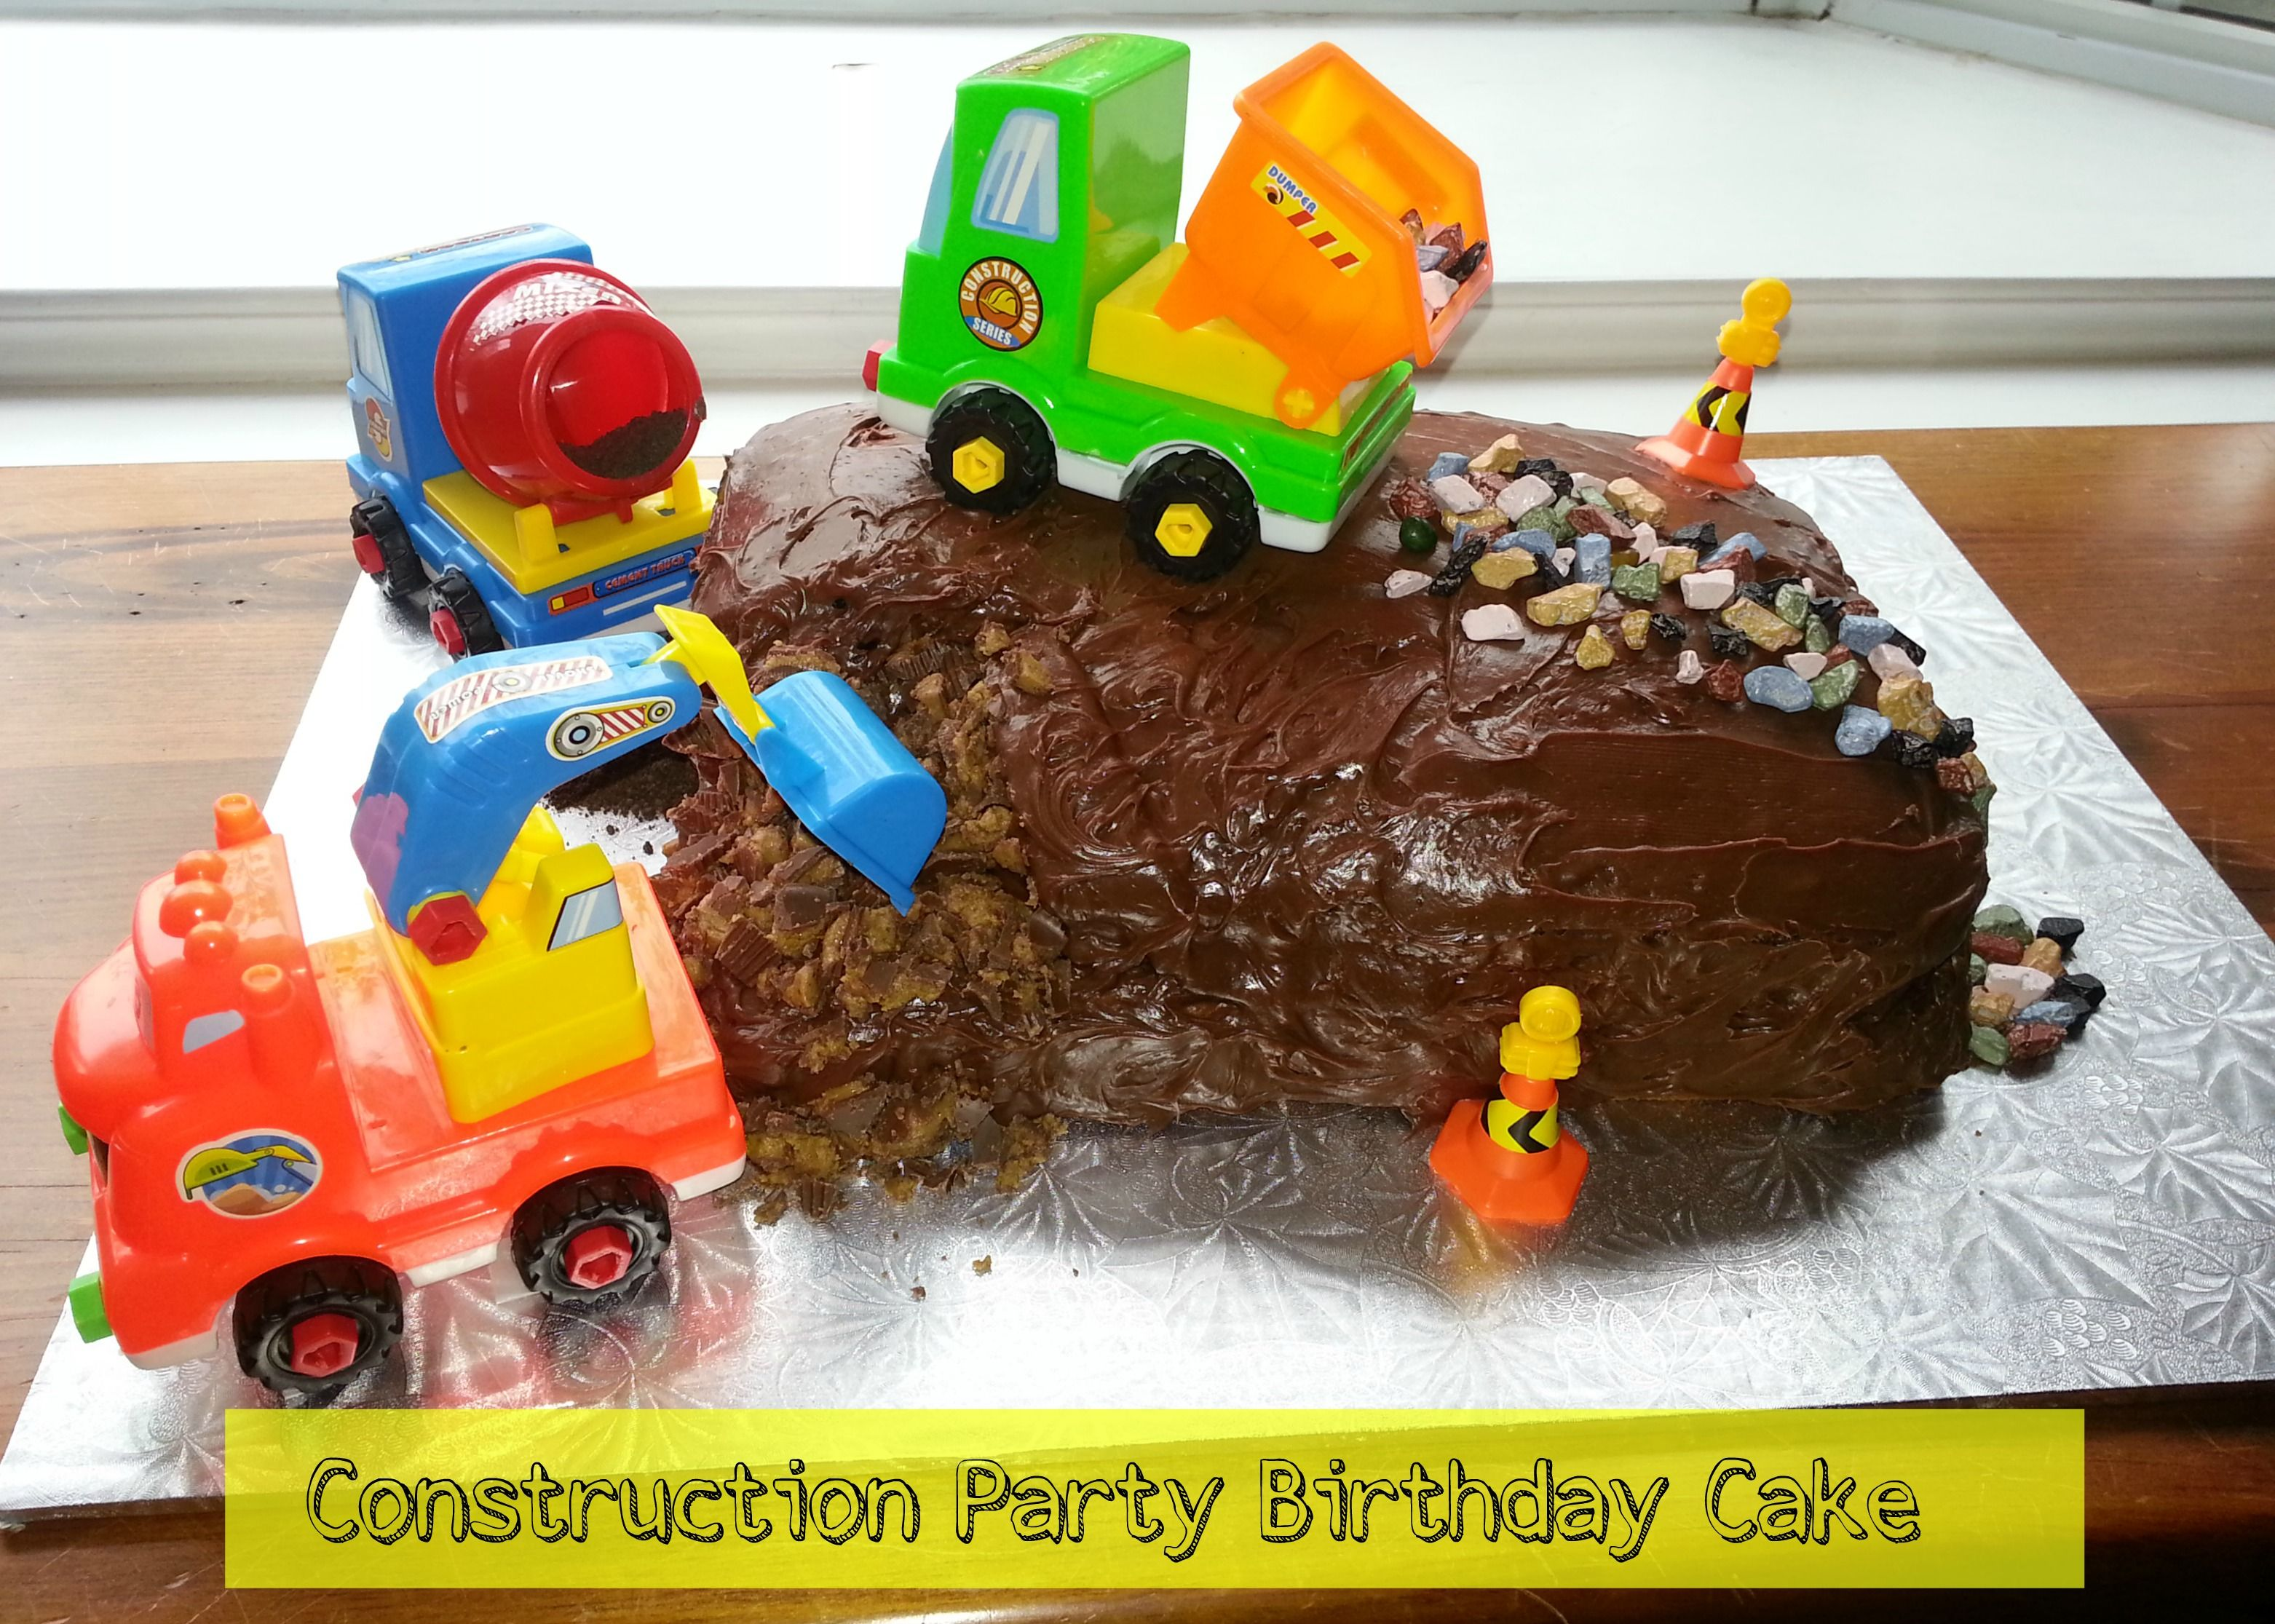 Birthday Party Ideas Construction Party Birthday Cake Pinterest